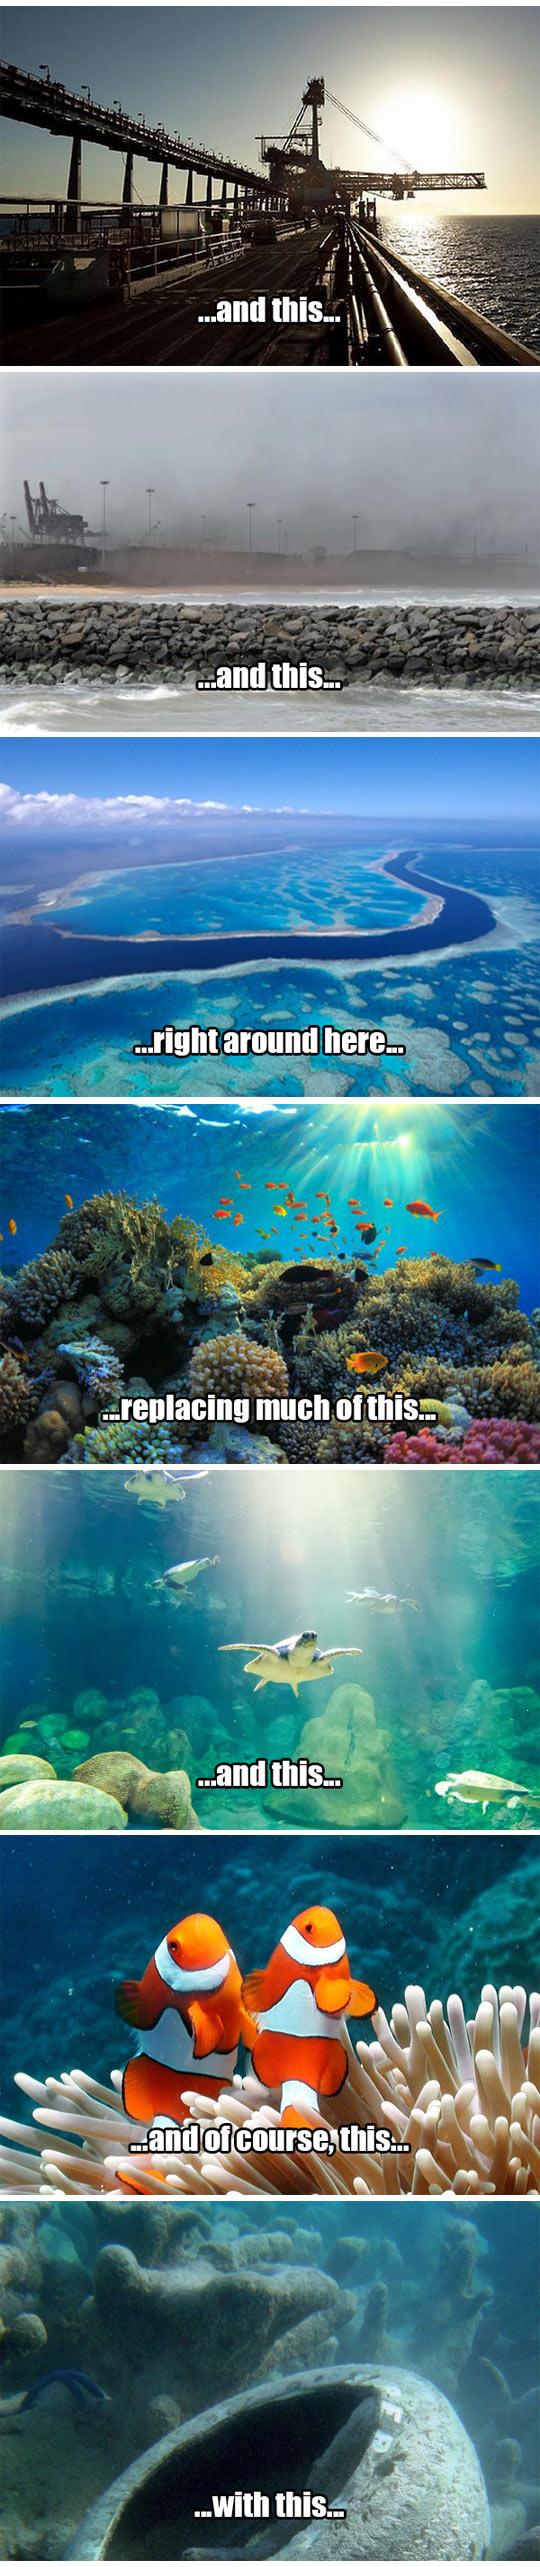 cool-Australia-Coral-reef-destruction-Abbot